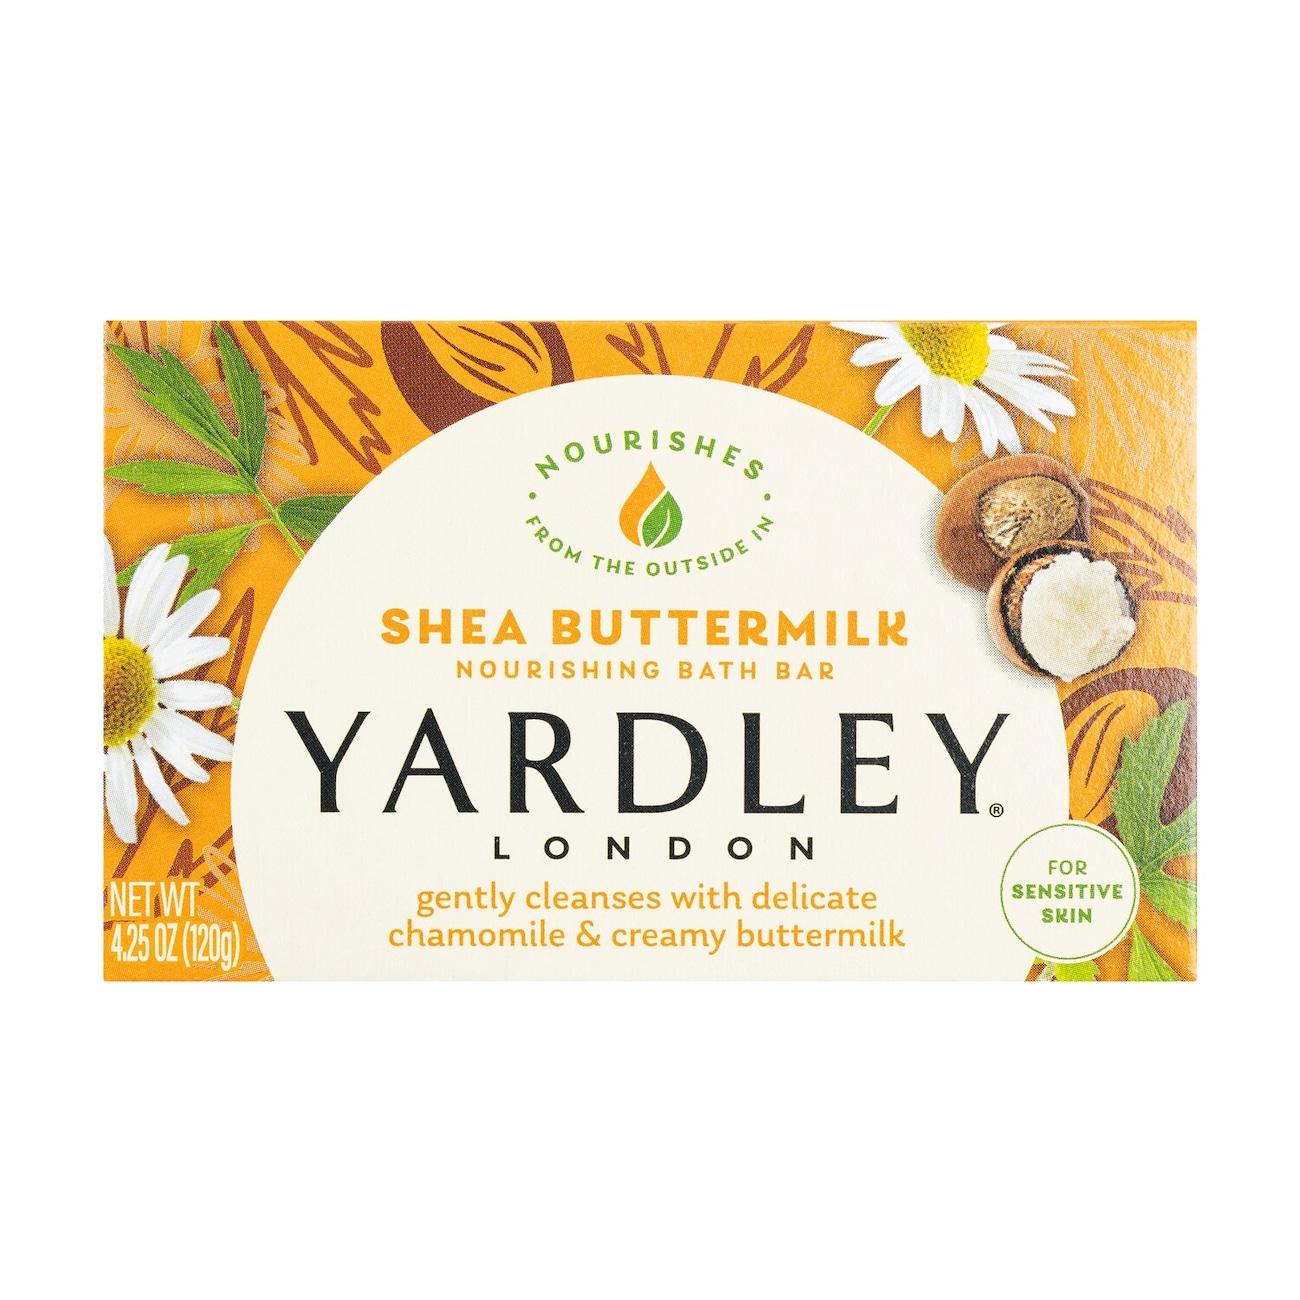 Bar Soap Ra Glow Display Product Reviews For Yardley Shea Buttermilk Sensitive Skin 425 Oz Bars